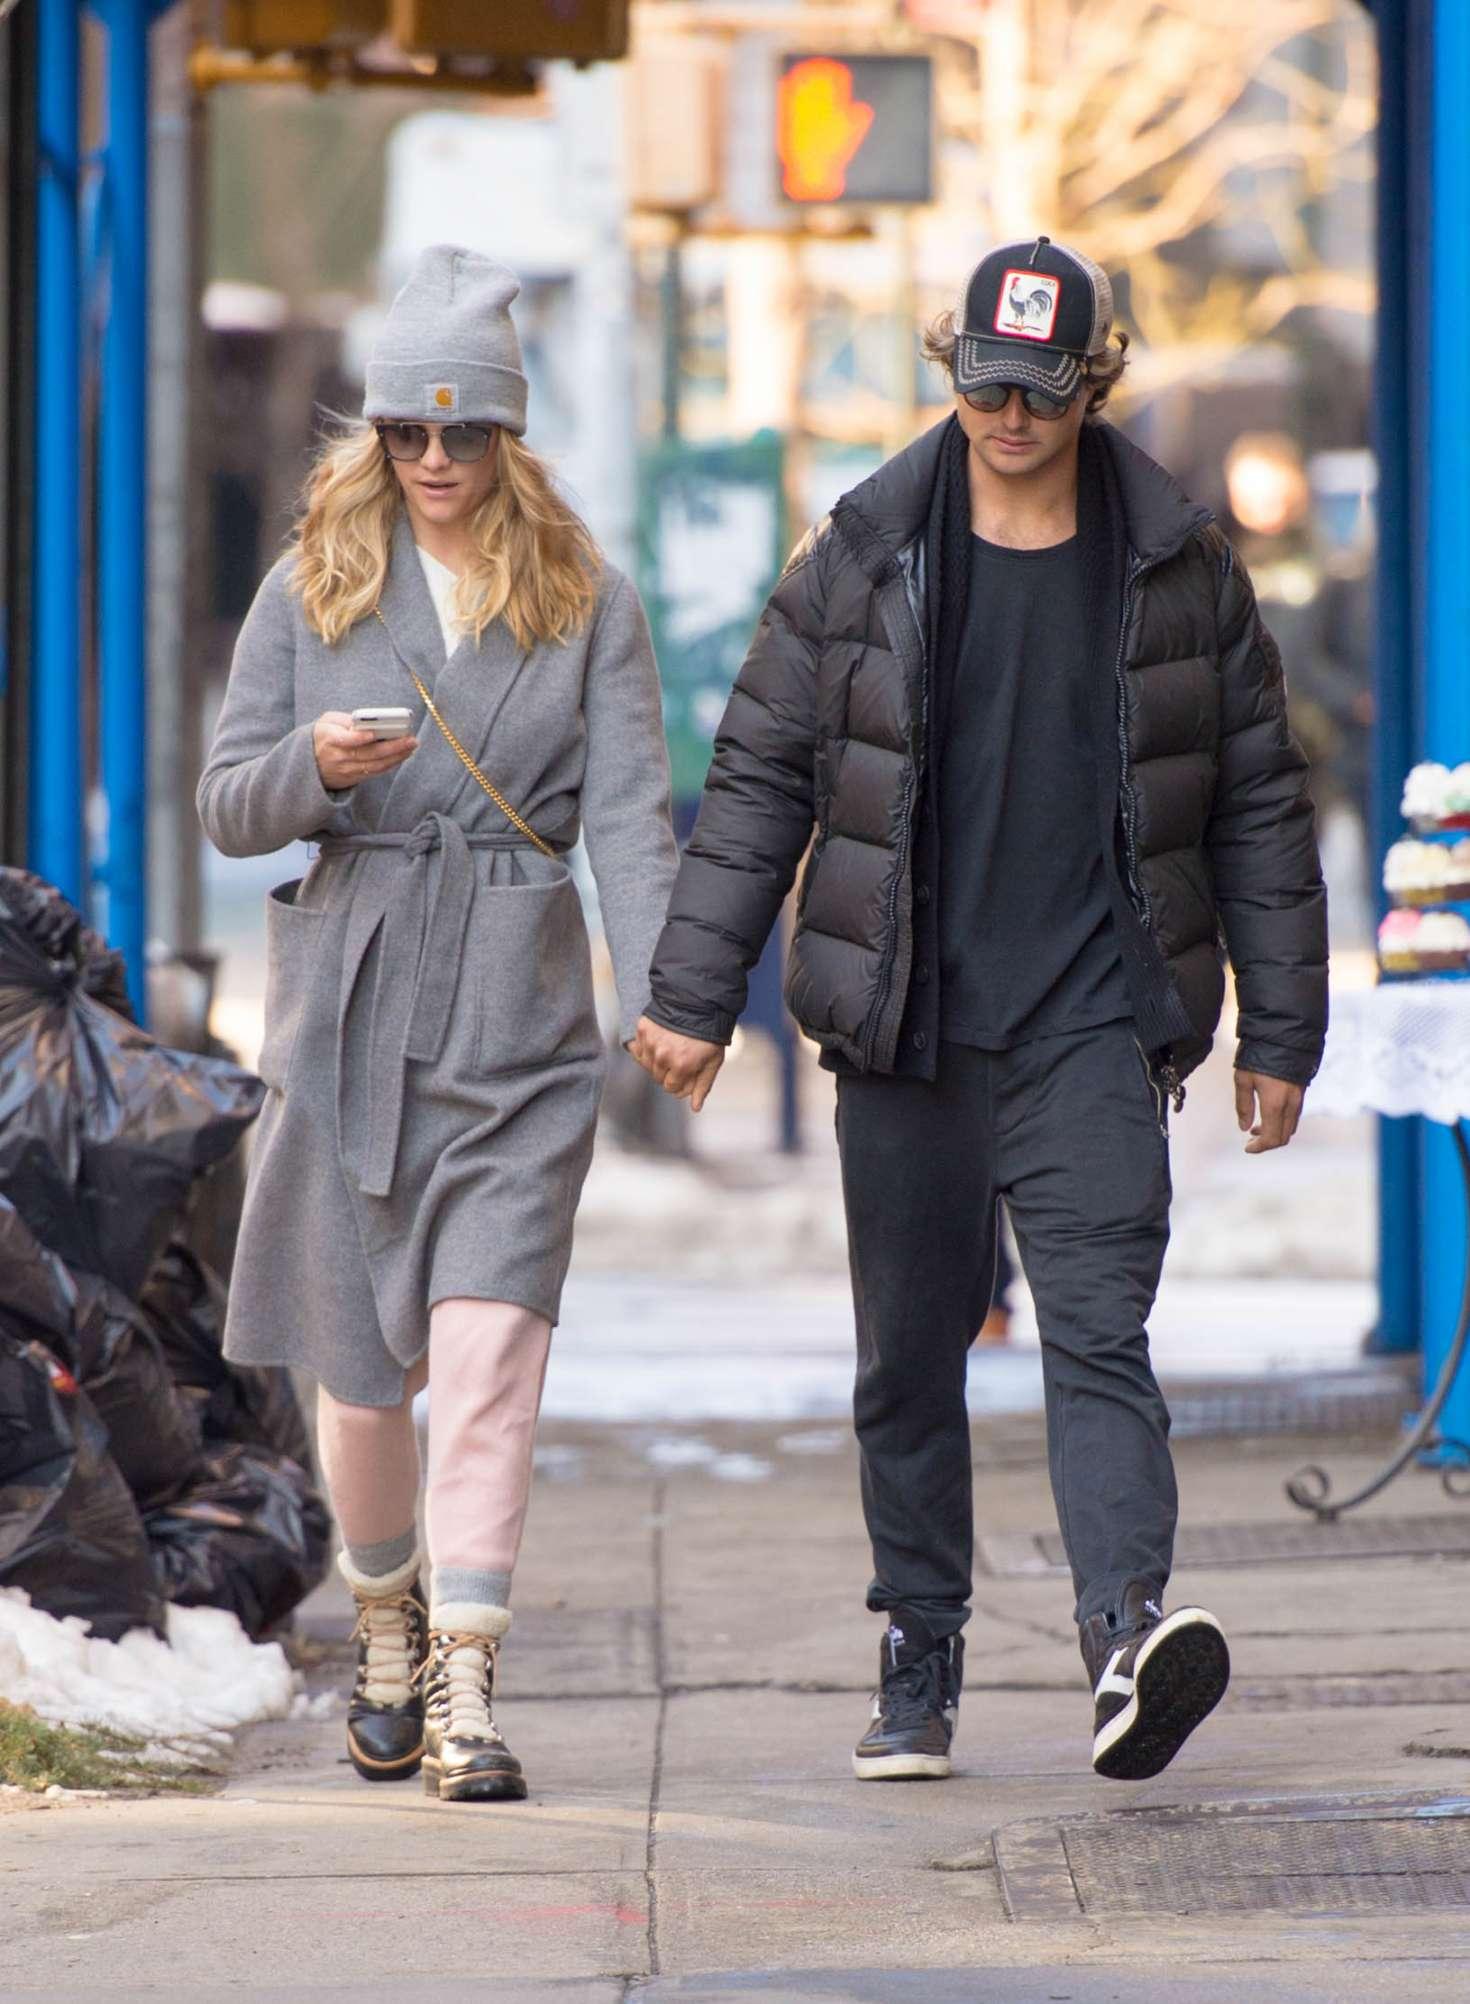 Nina Agdal 2018 : Nina Agdal: Shopping with boyfriend Jack Brinkley-Cook -16